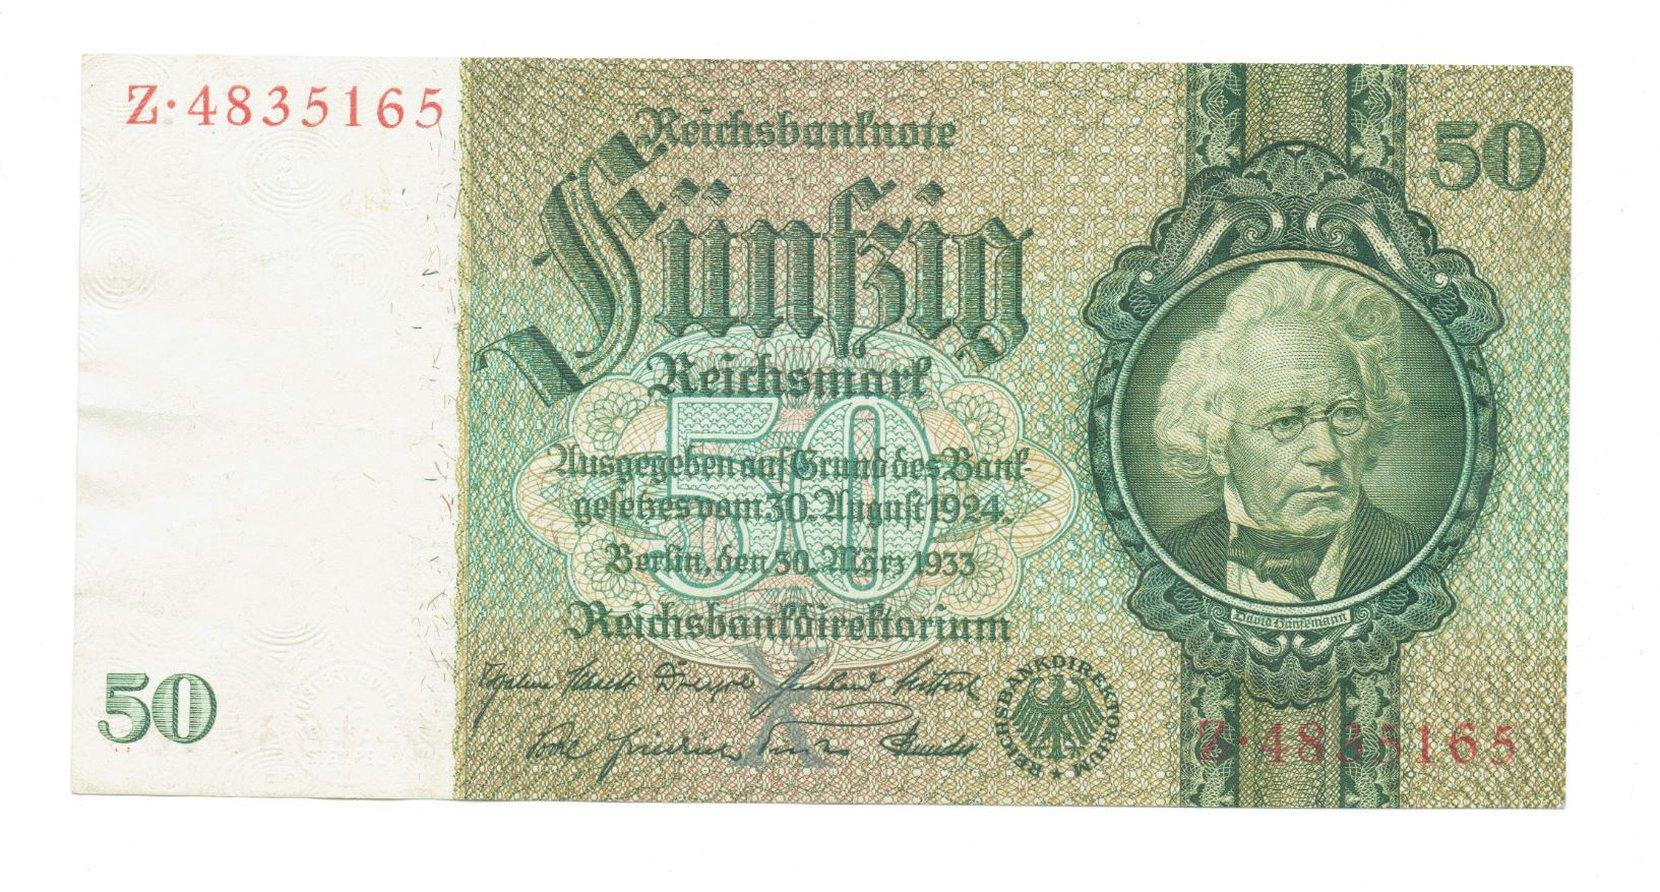 germany - 50 reichsmark, 1933r. unc numismatics banknotes